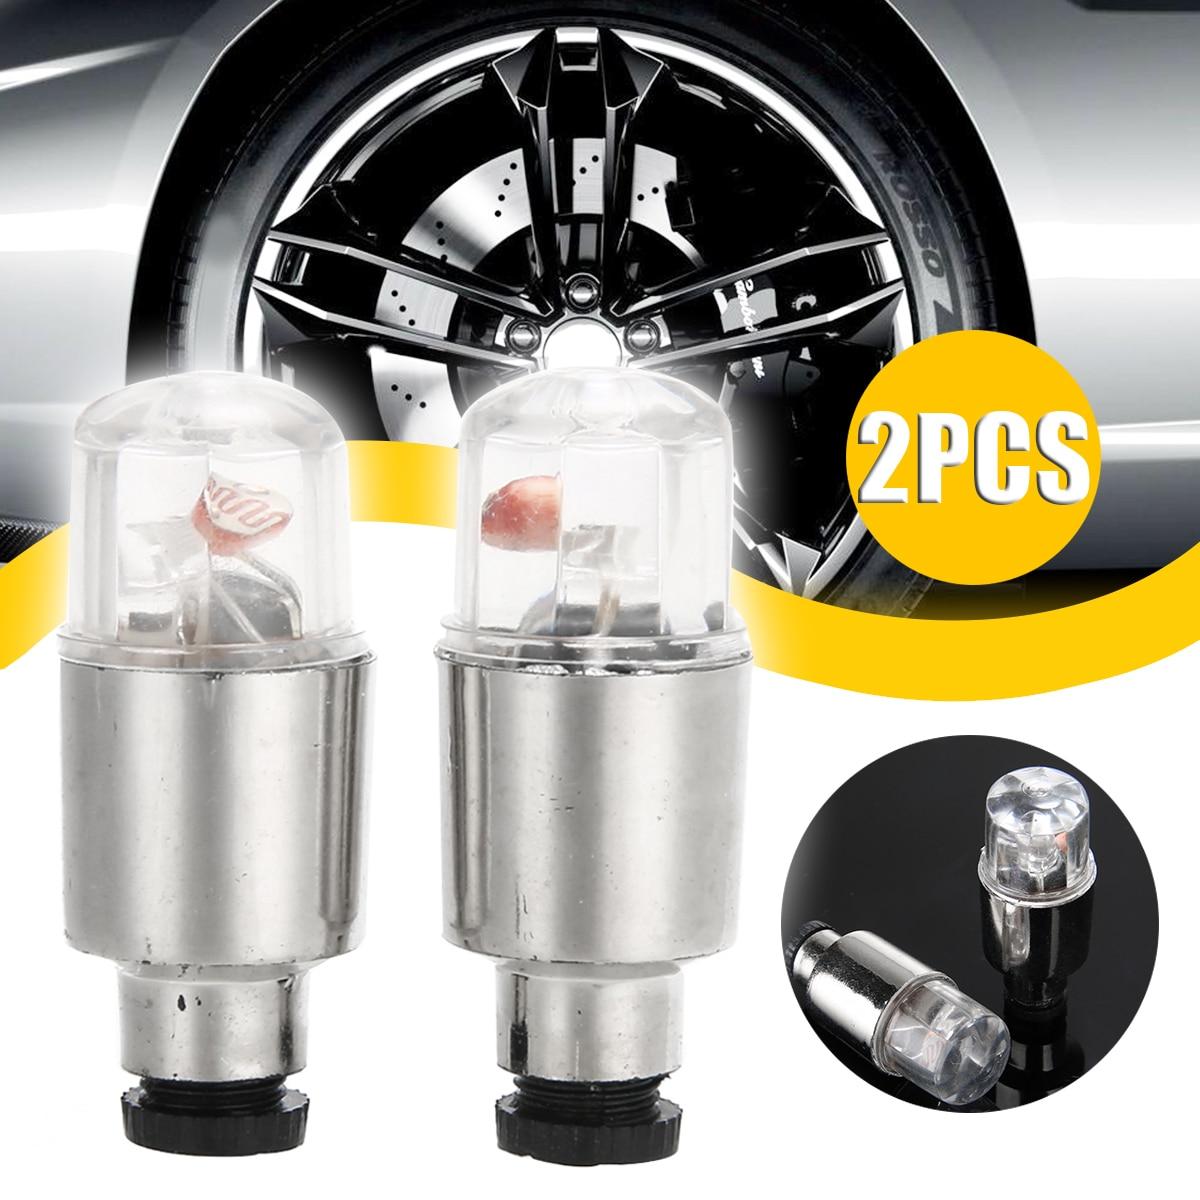 4 PCS Bike Car Motorcycle Wheel Tire Tyre Valve Cap Spoke Neon-LED Flash Lights